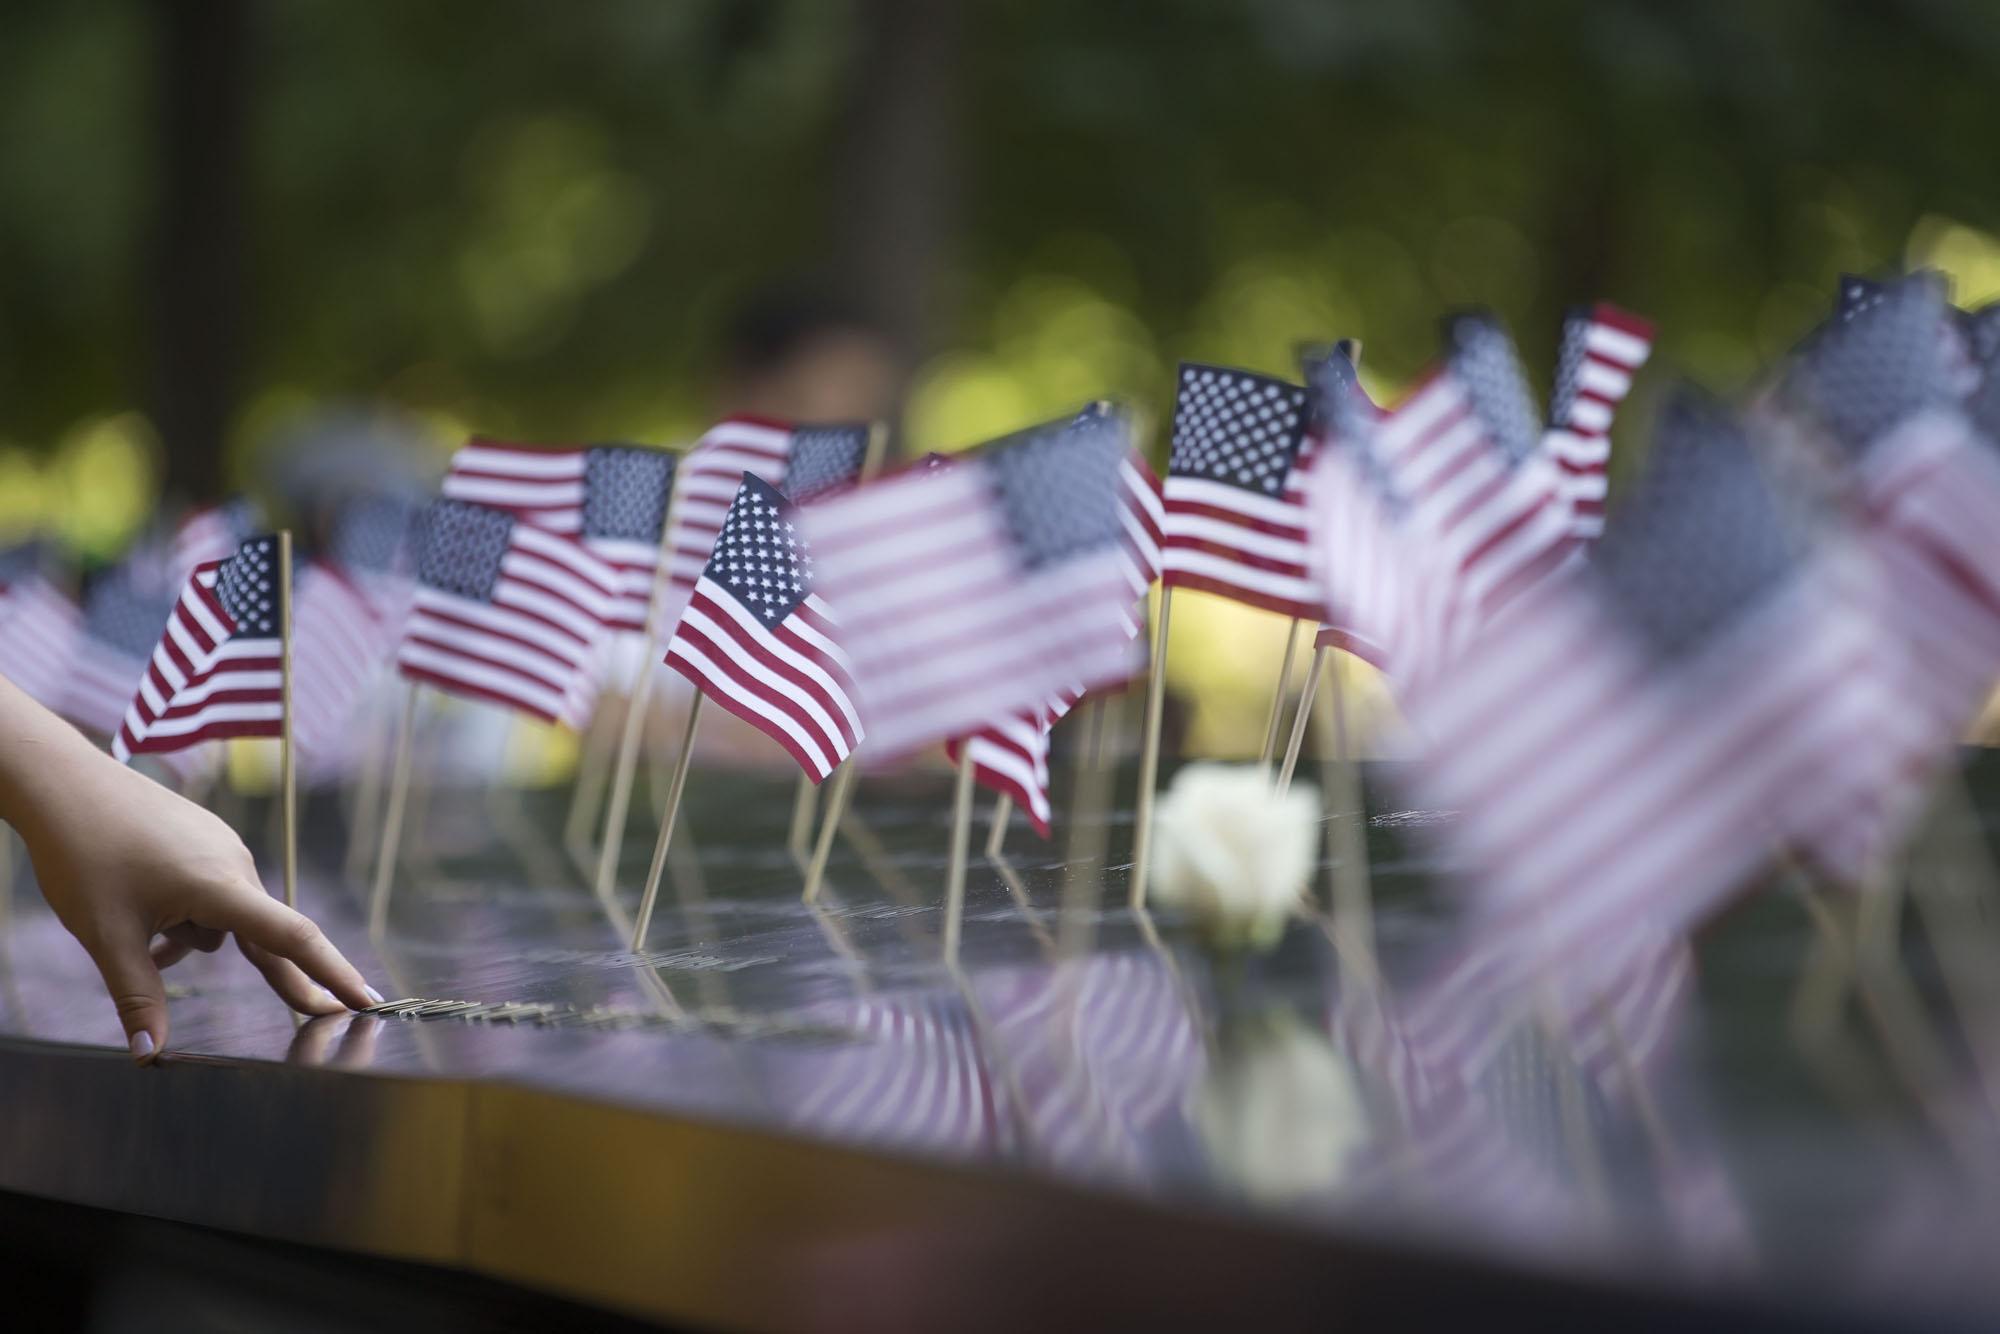 9/11 Memorial 4th of July American Flag